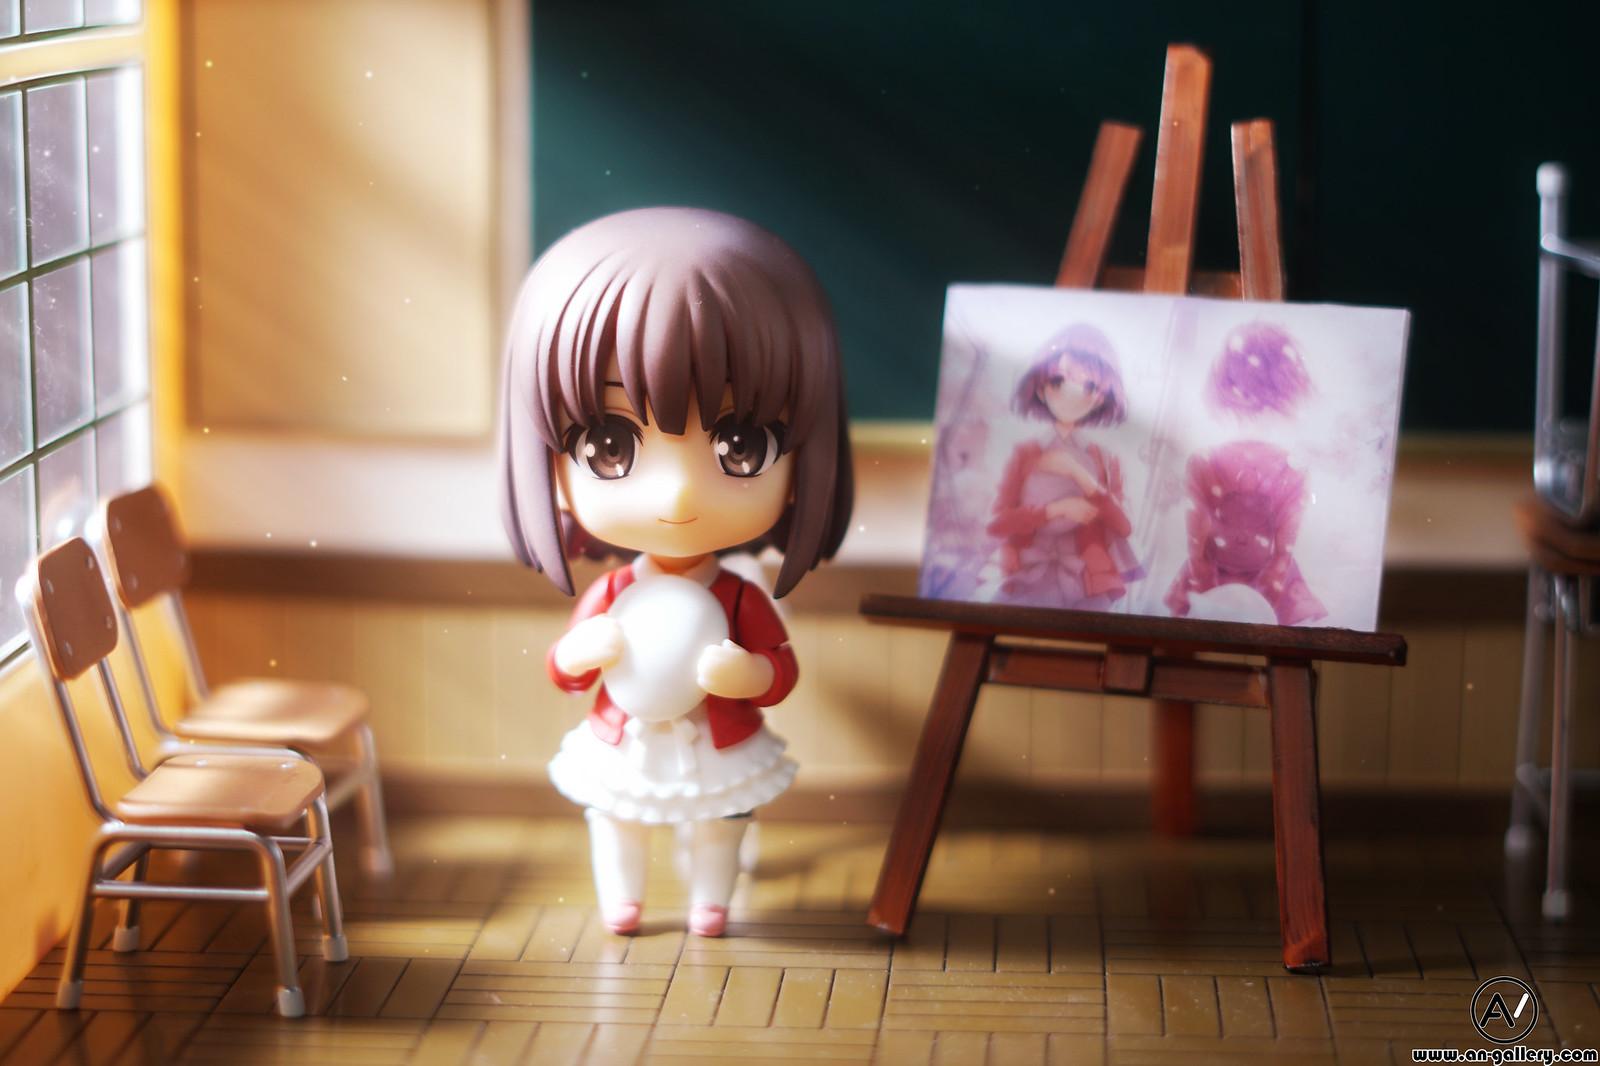 Nendoroid Megumi Kato – Classroom – Painting